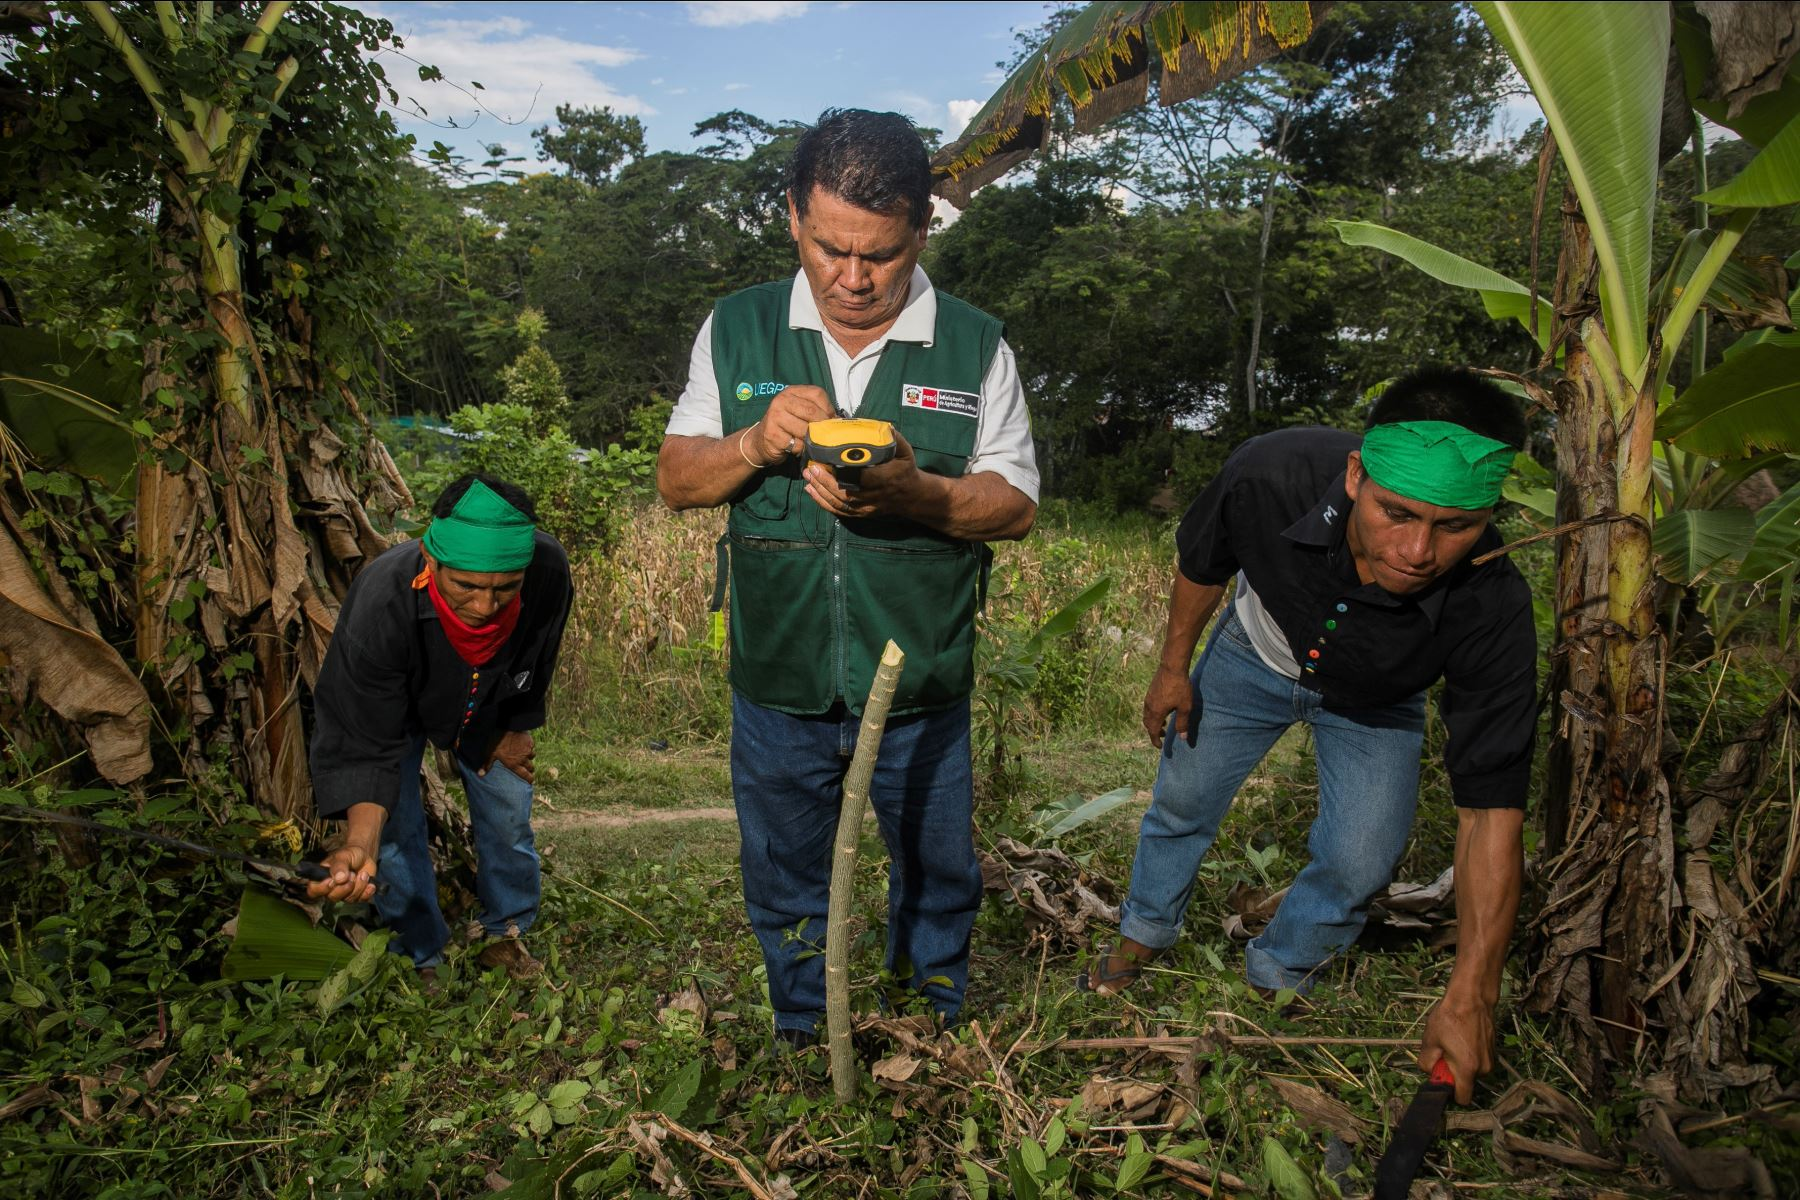 Minagri iniciará trabajo para titular 26 comunidades indígenas de Loreto. ANDINA/Difusión